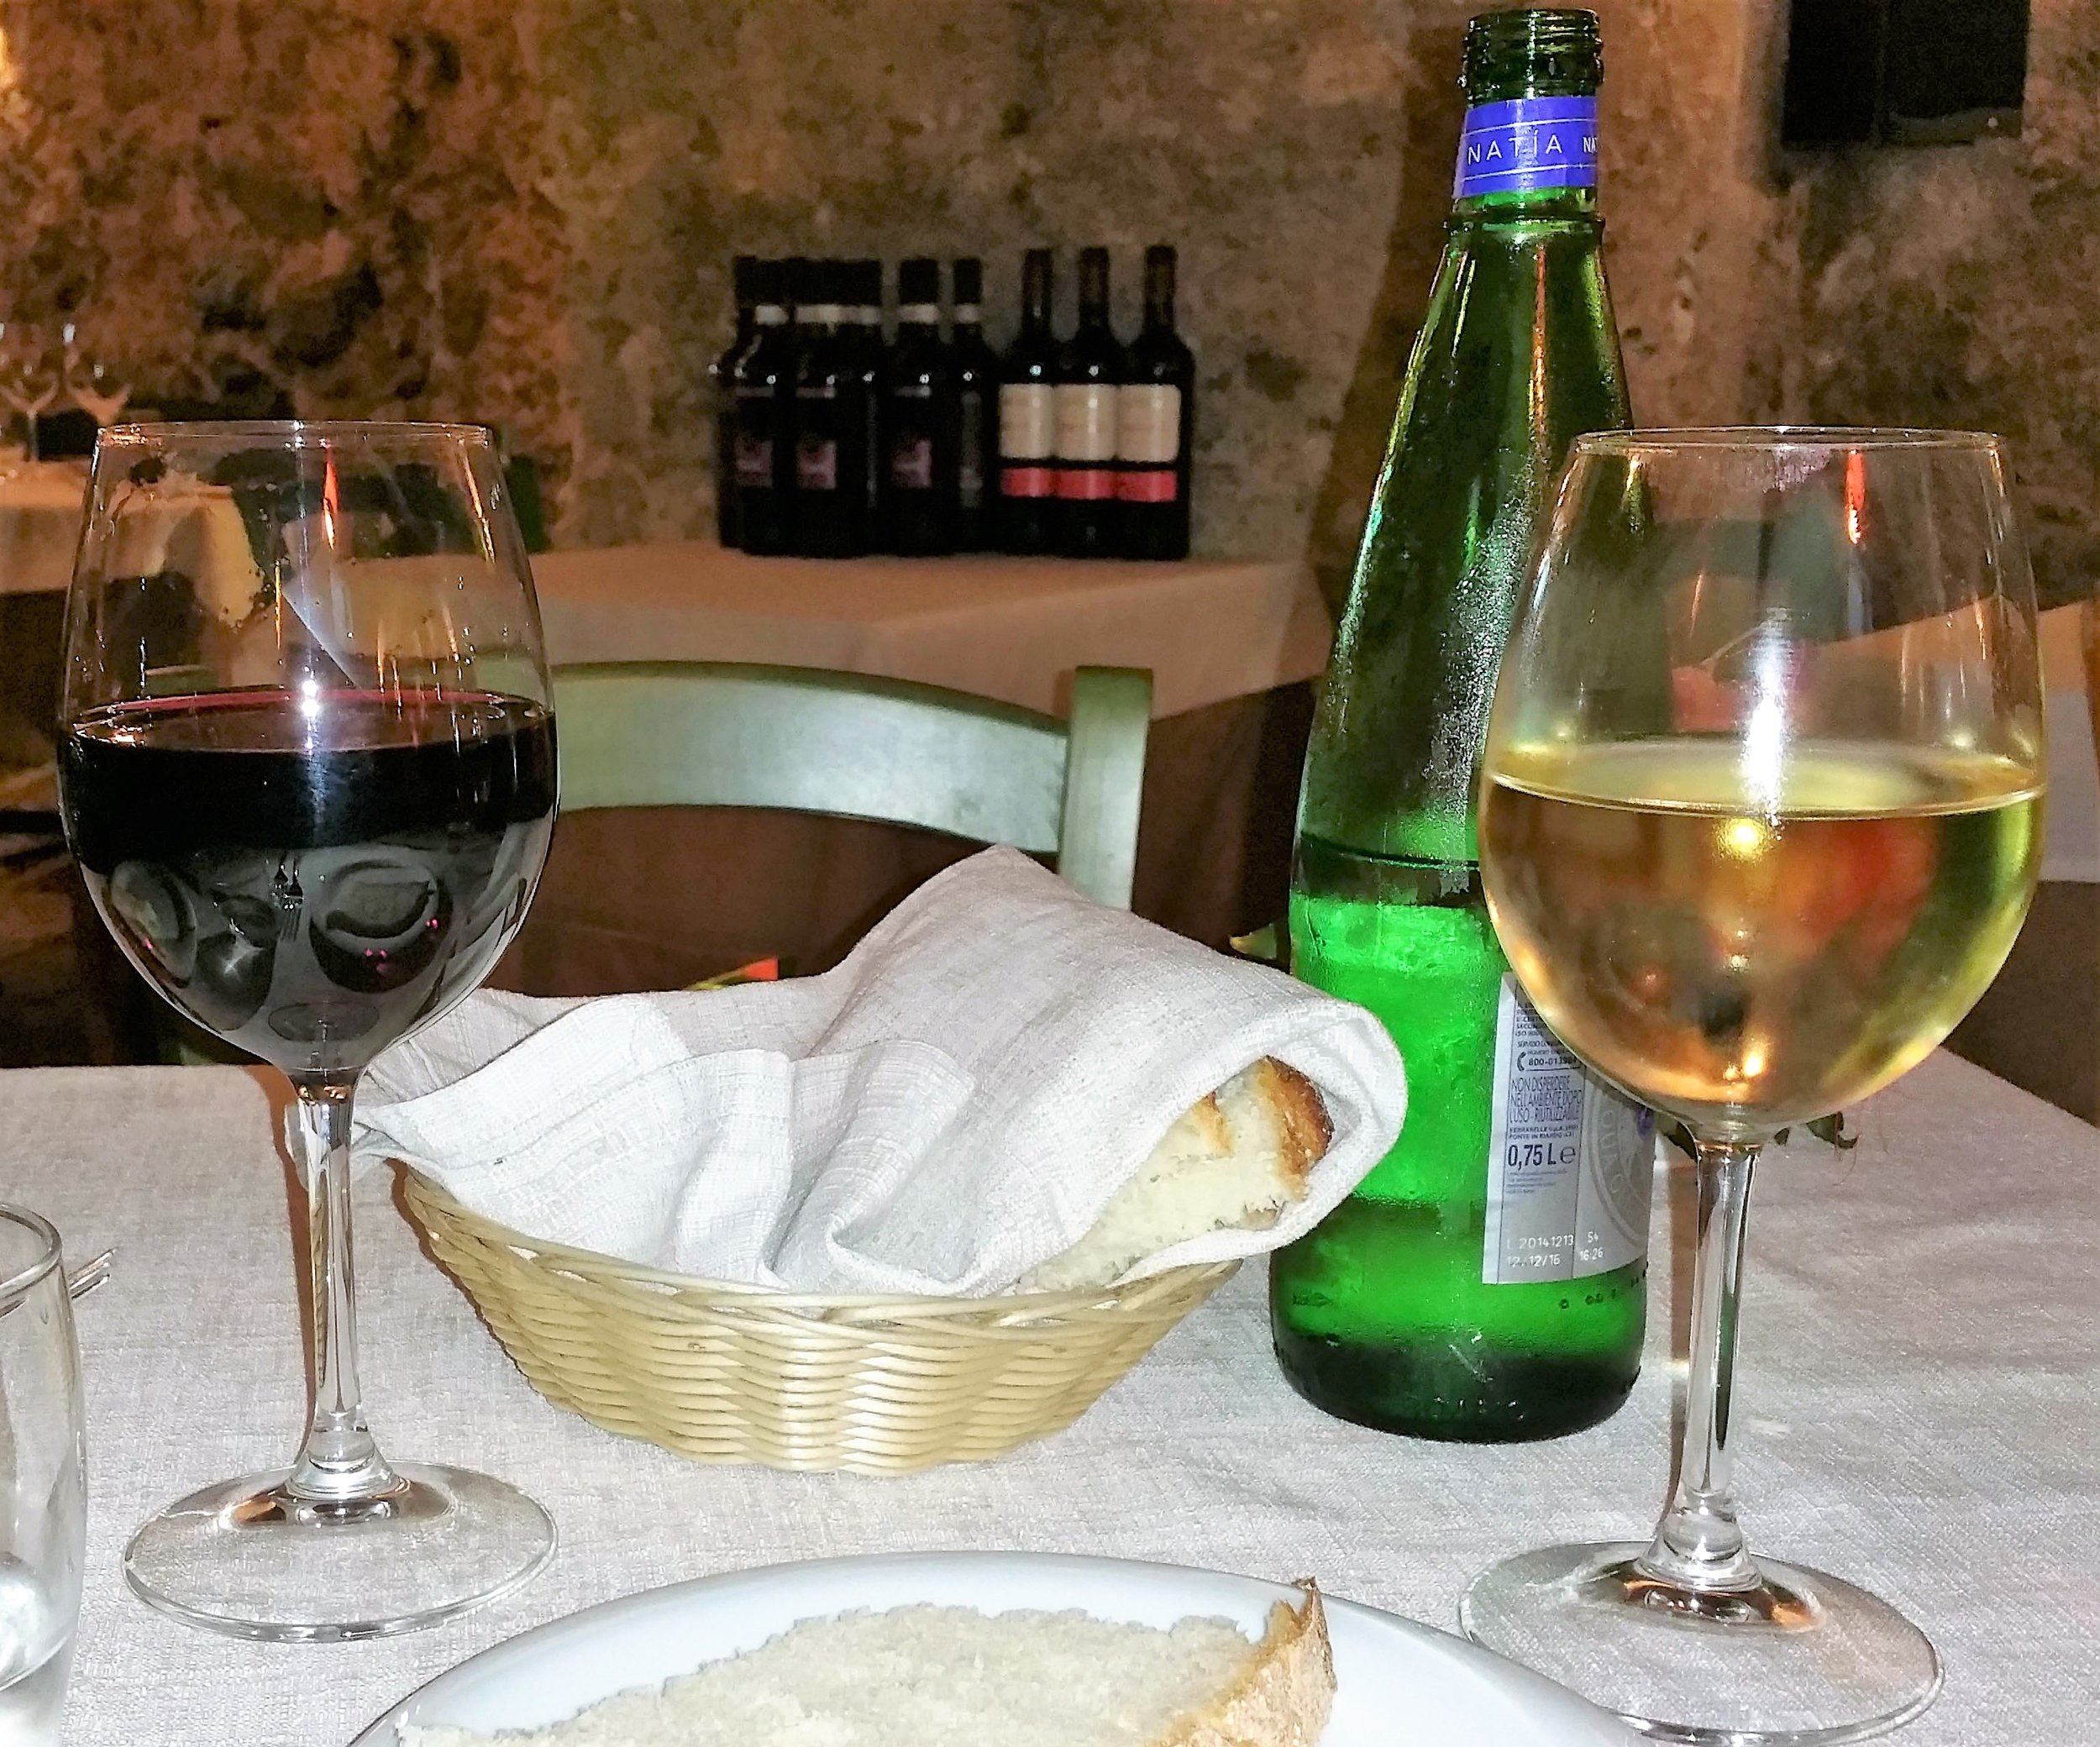 House wine, Salerno, Italy